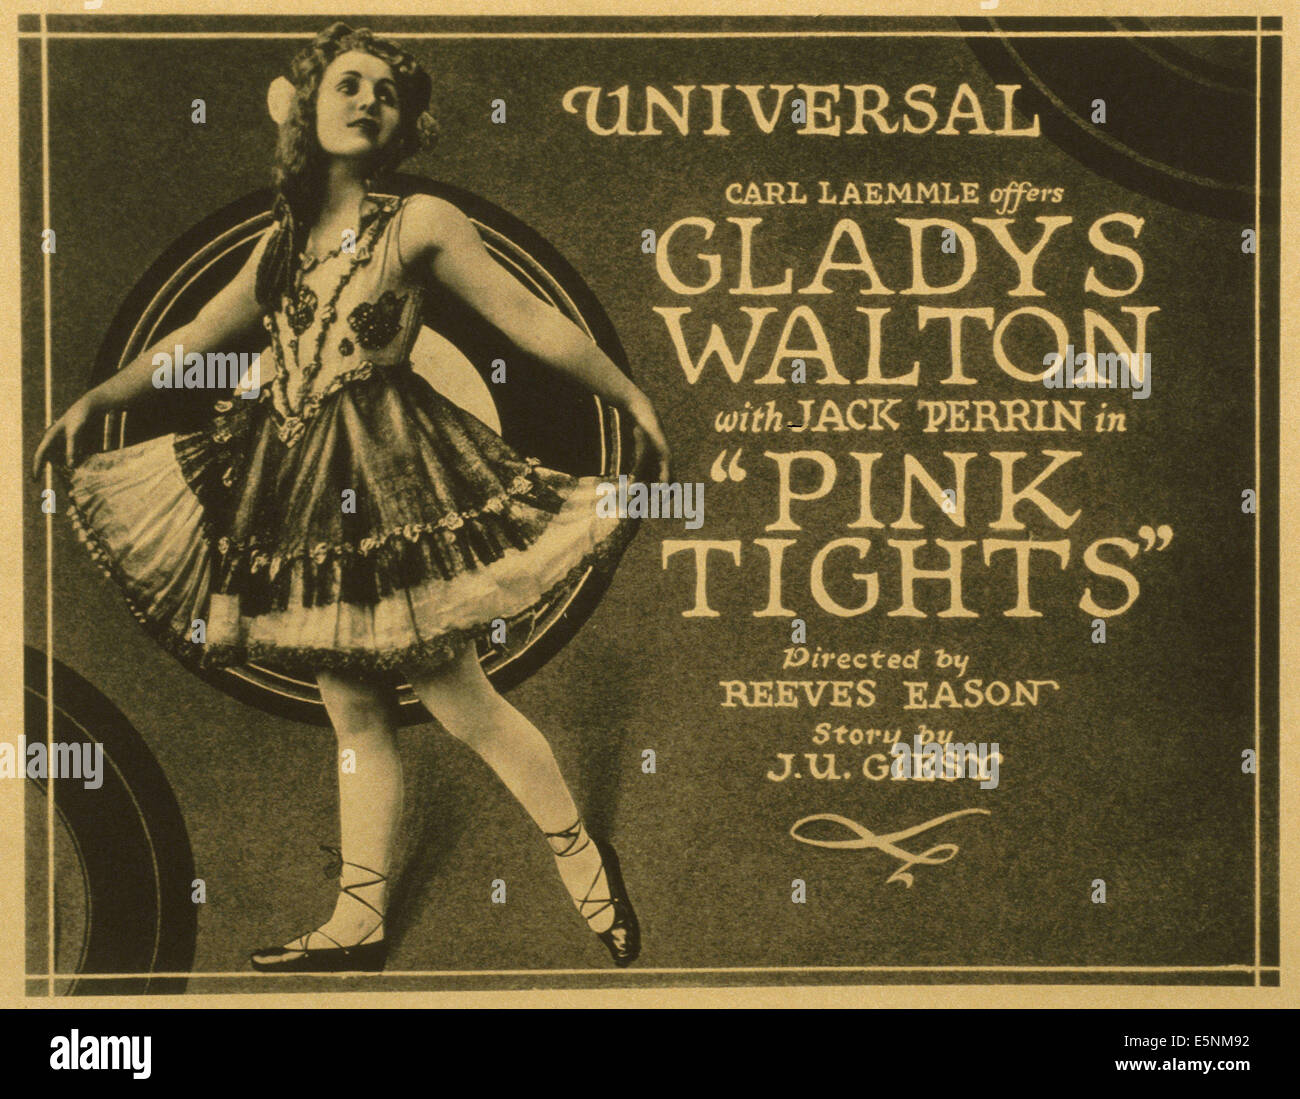 Gladys Walton